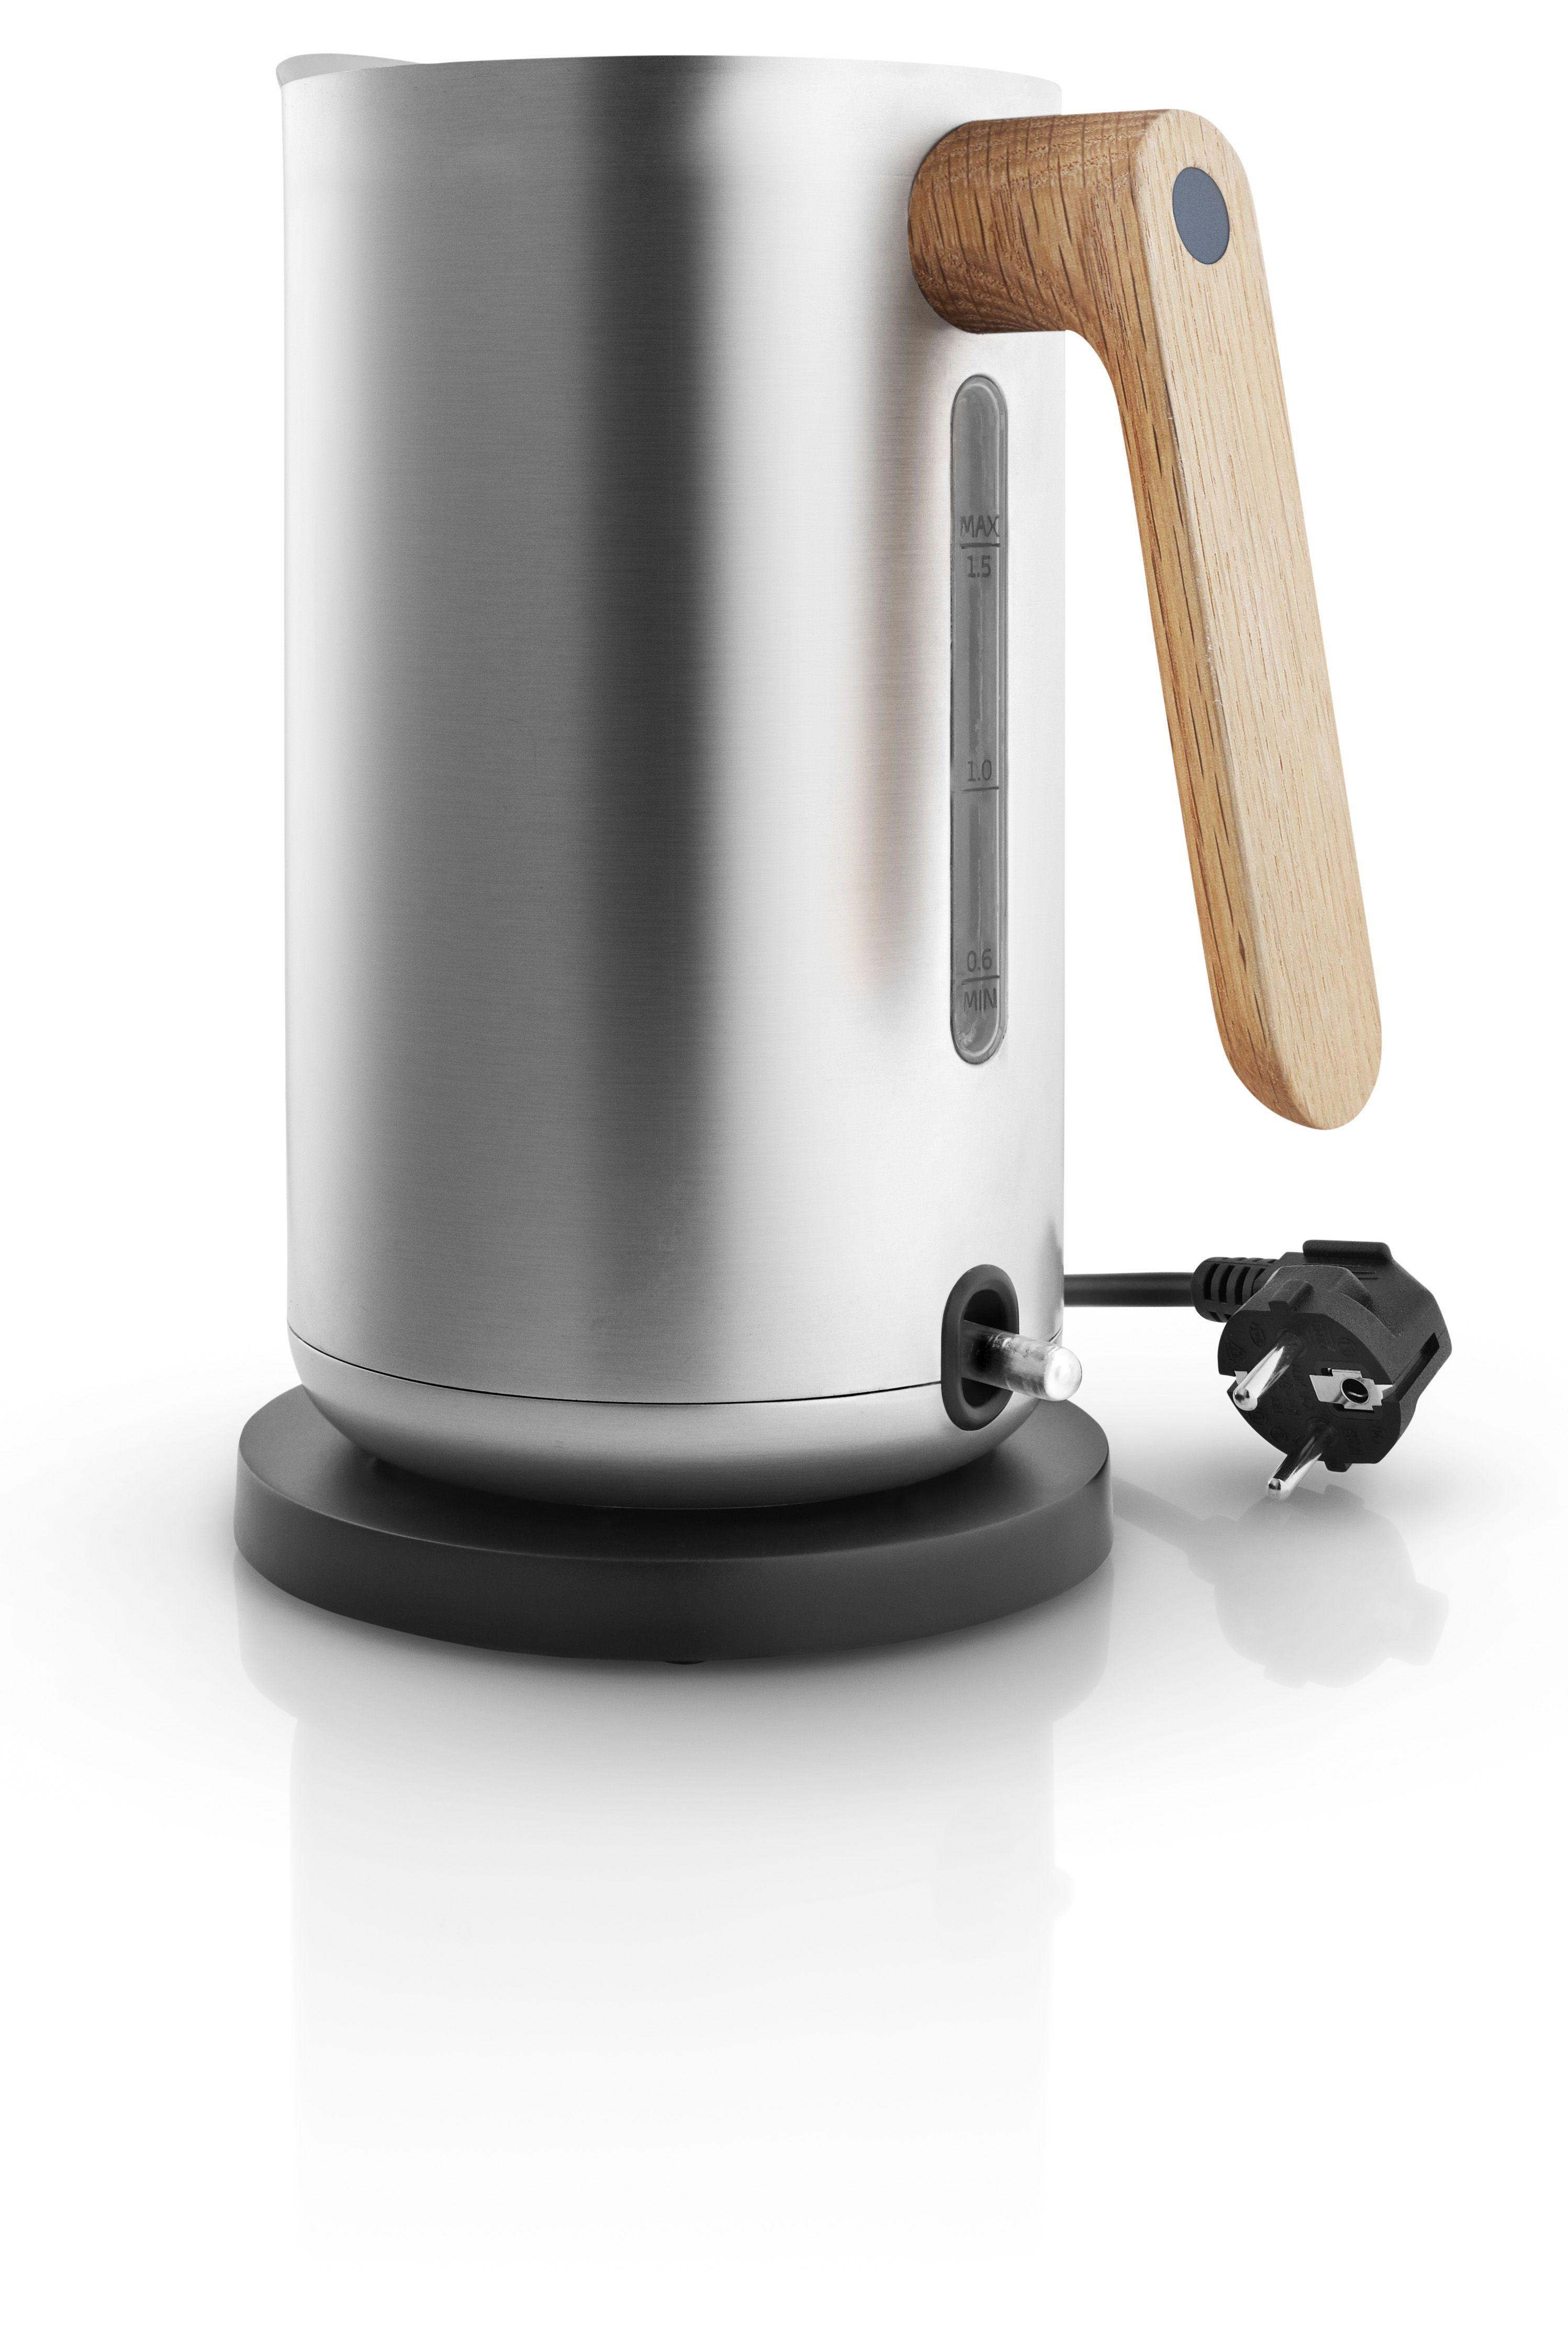 Nordic Kitchen Electric kettle Eva